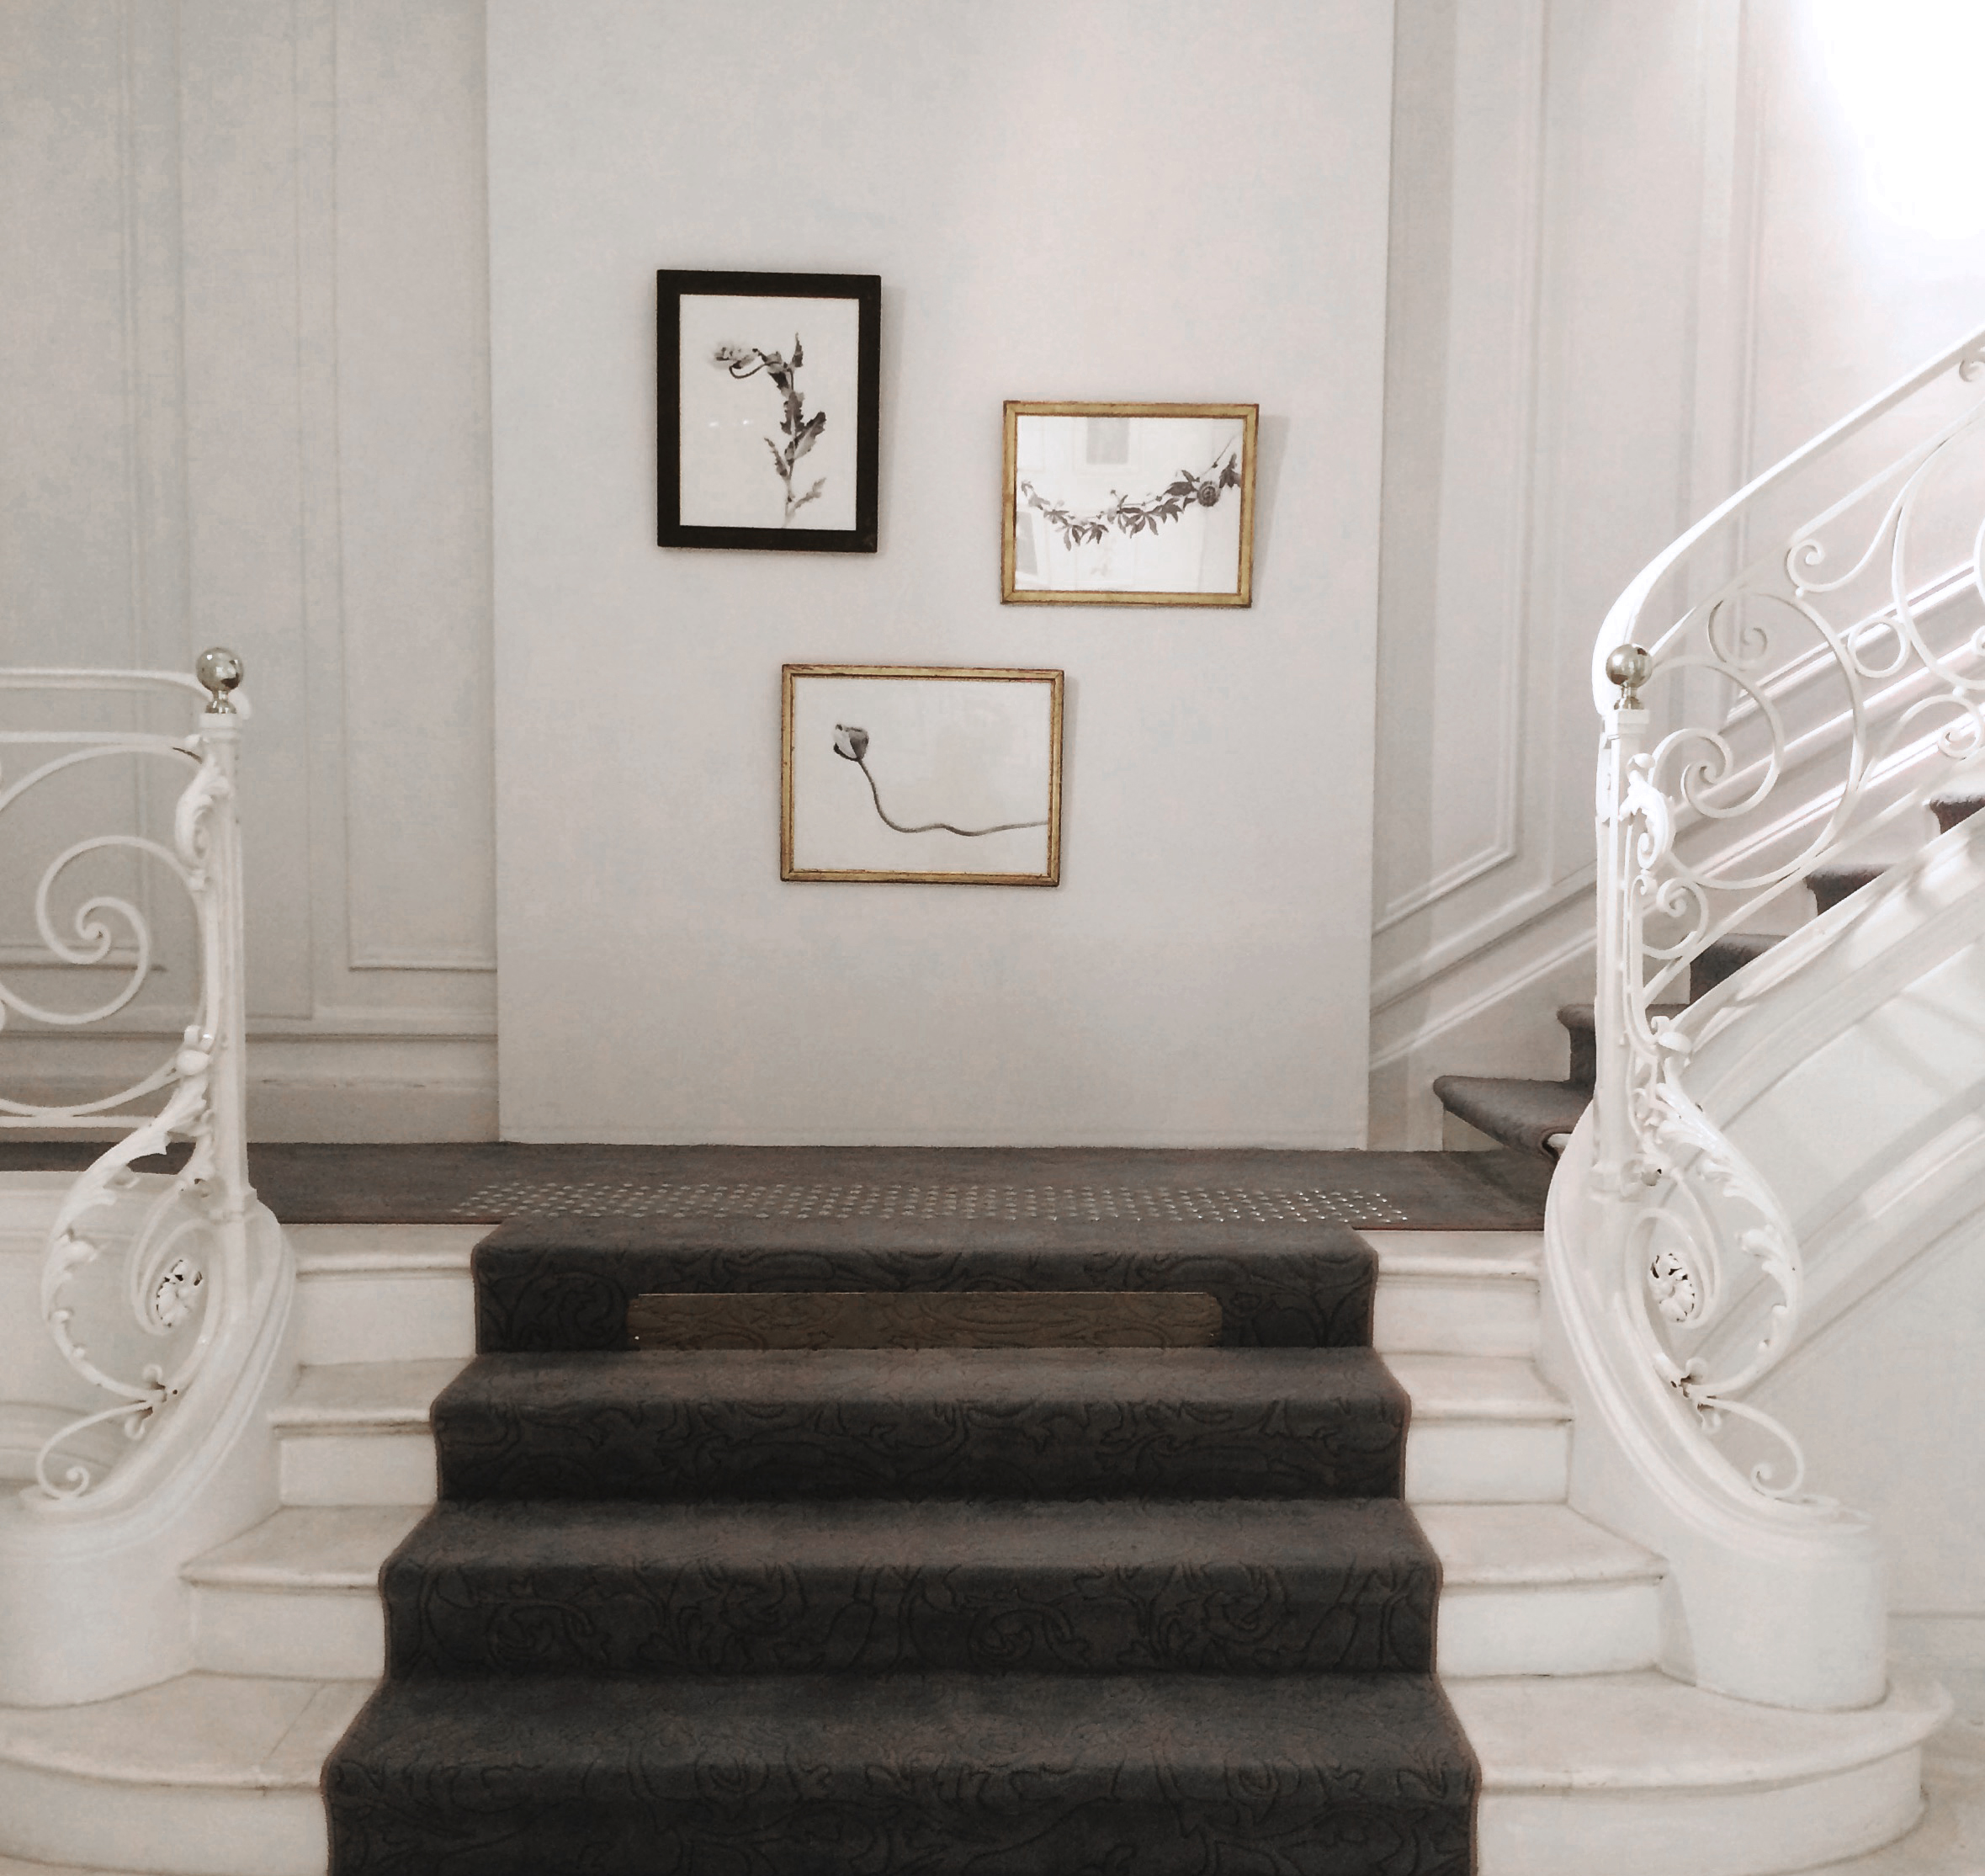 5-Exposition-Blandine-Chambost.jpg